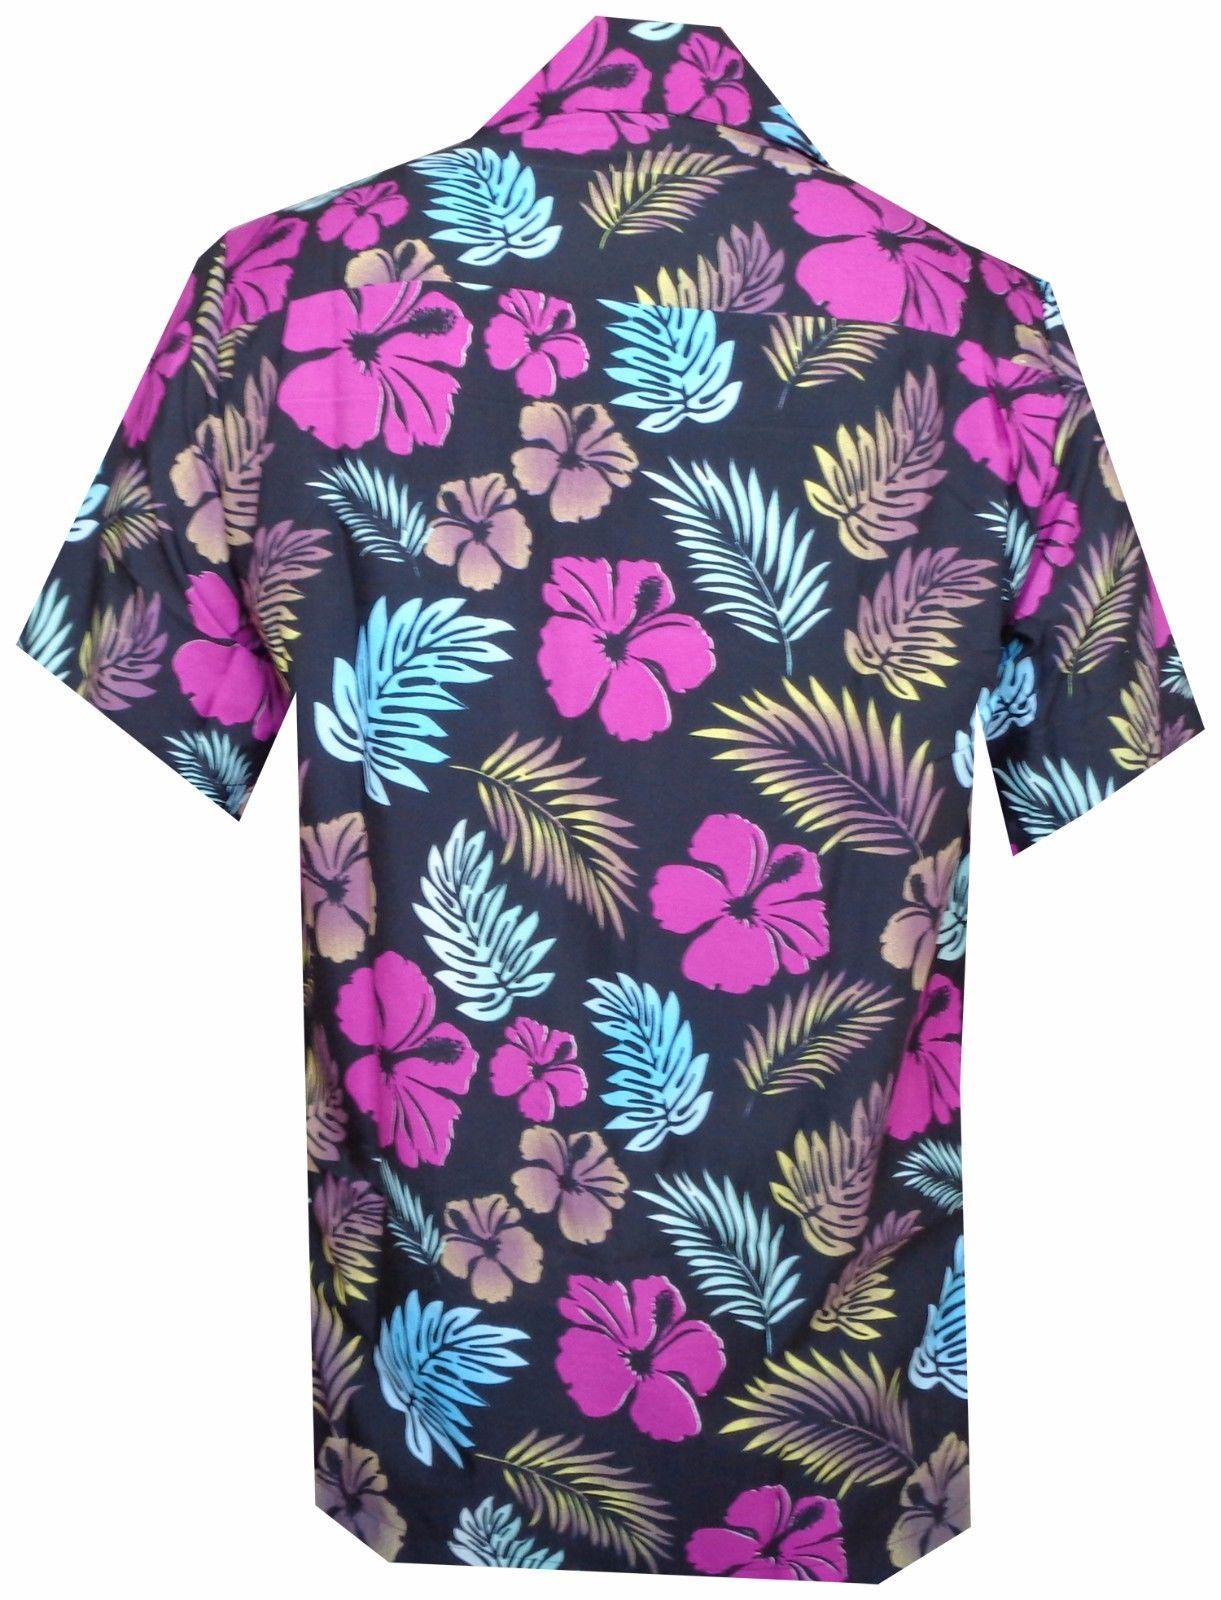 Hawaiian-Shirt-Mens-Hibiscus-Floral-Leaf-Print-Beach-Aloha-Camp-Party thumbnail 11